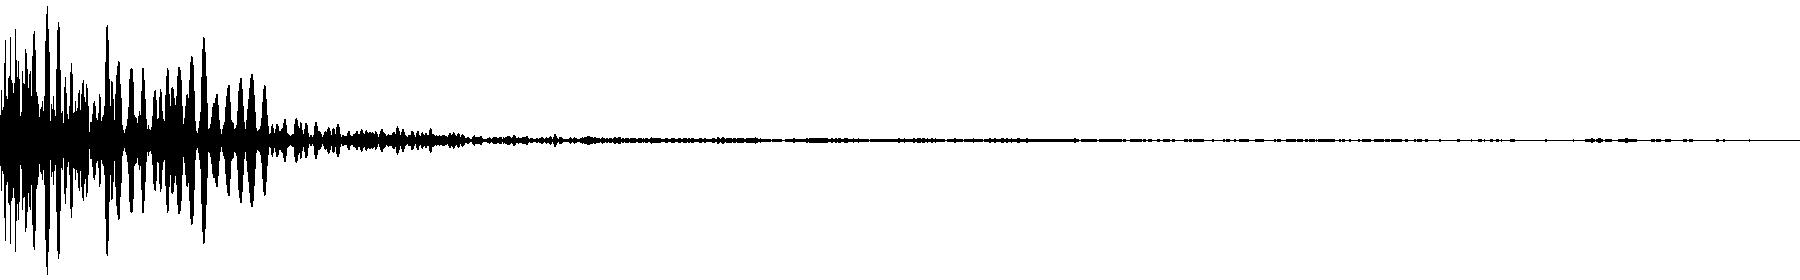 bluezone bc0210 percussion 007